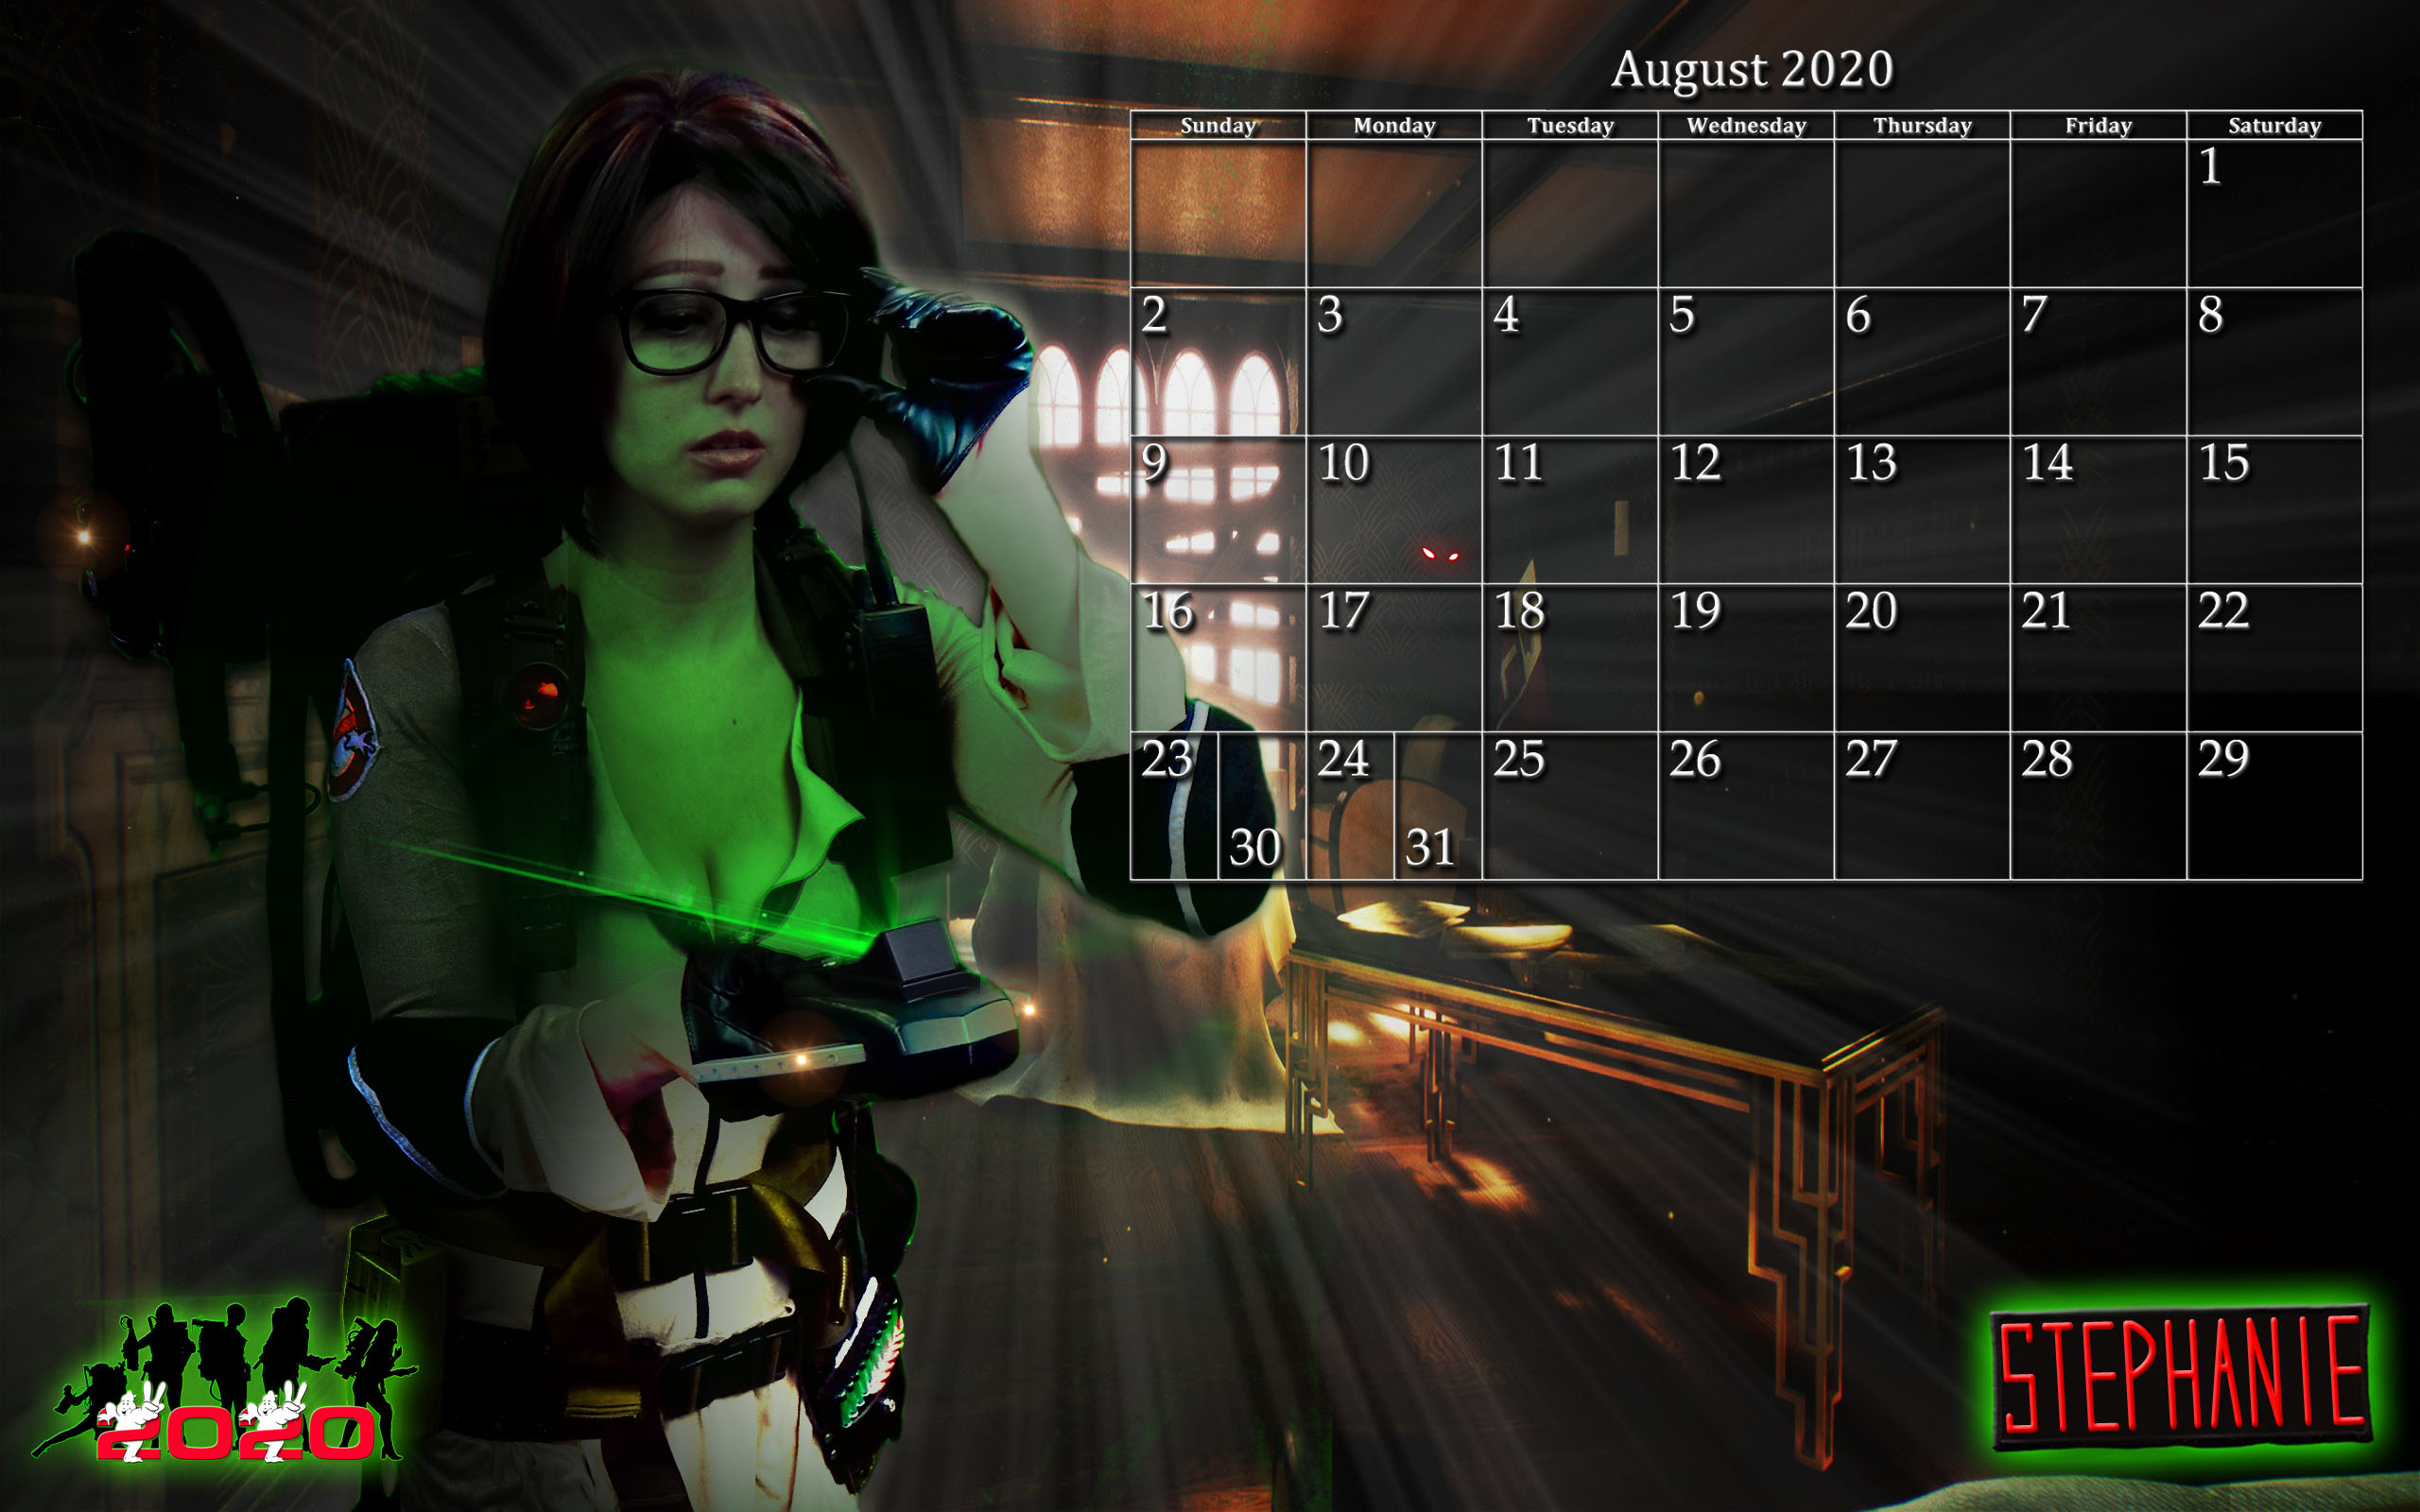 Lego Calendar August 2021 Ghostbusters Calendar: August 2020   Ghostbusters News